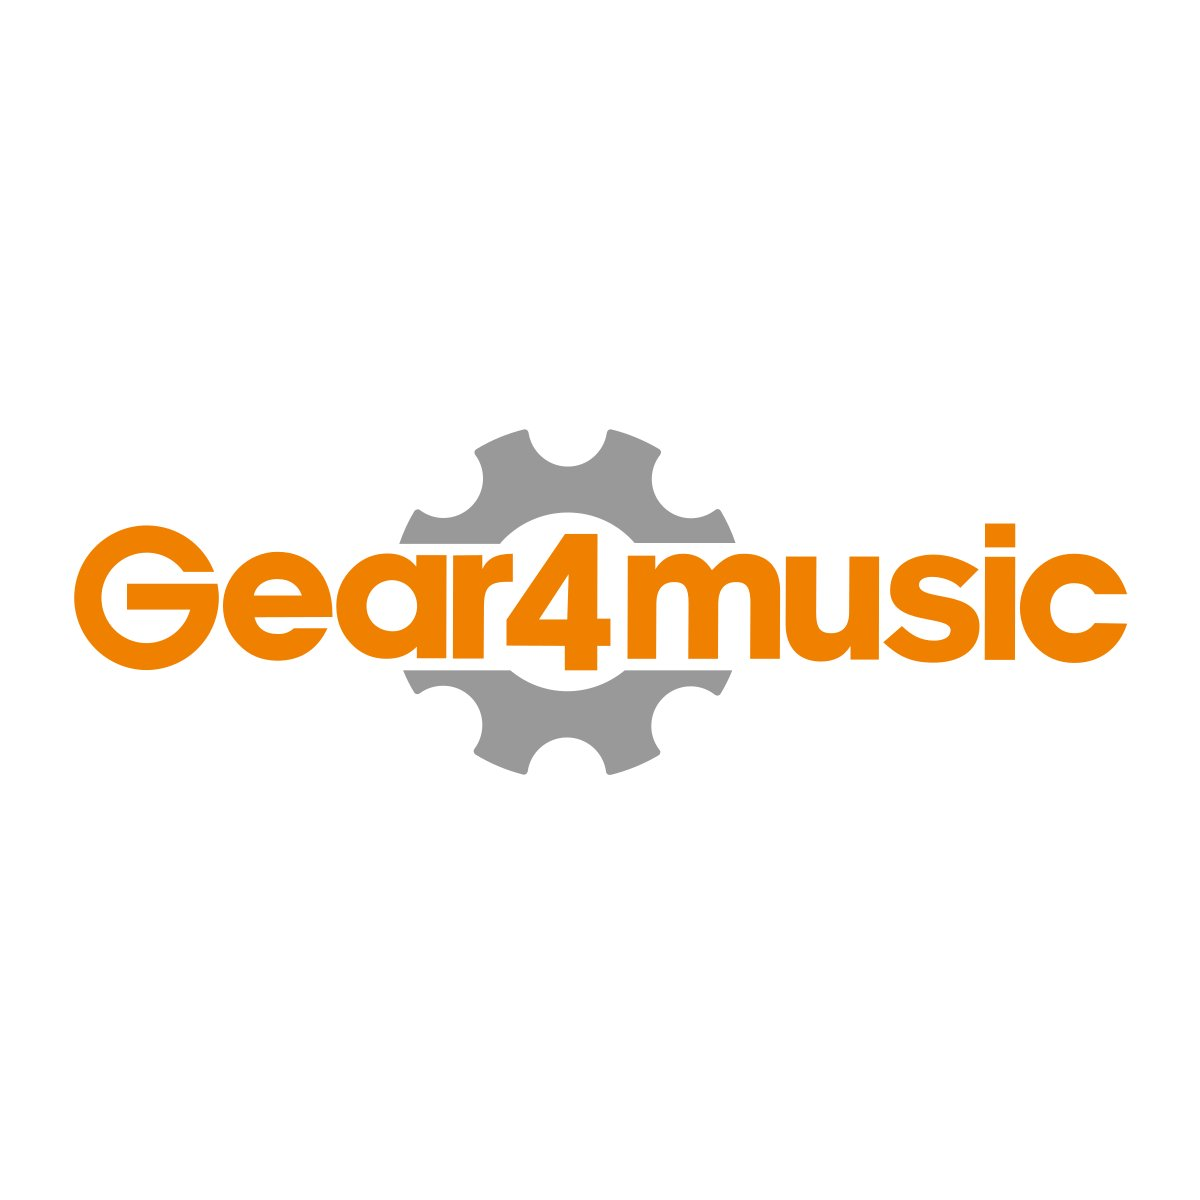 epiphone slash afd les paul special ii pack guitare lectrique gear4music. Black Bedroom Furniture Sets. Home Design Ideas